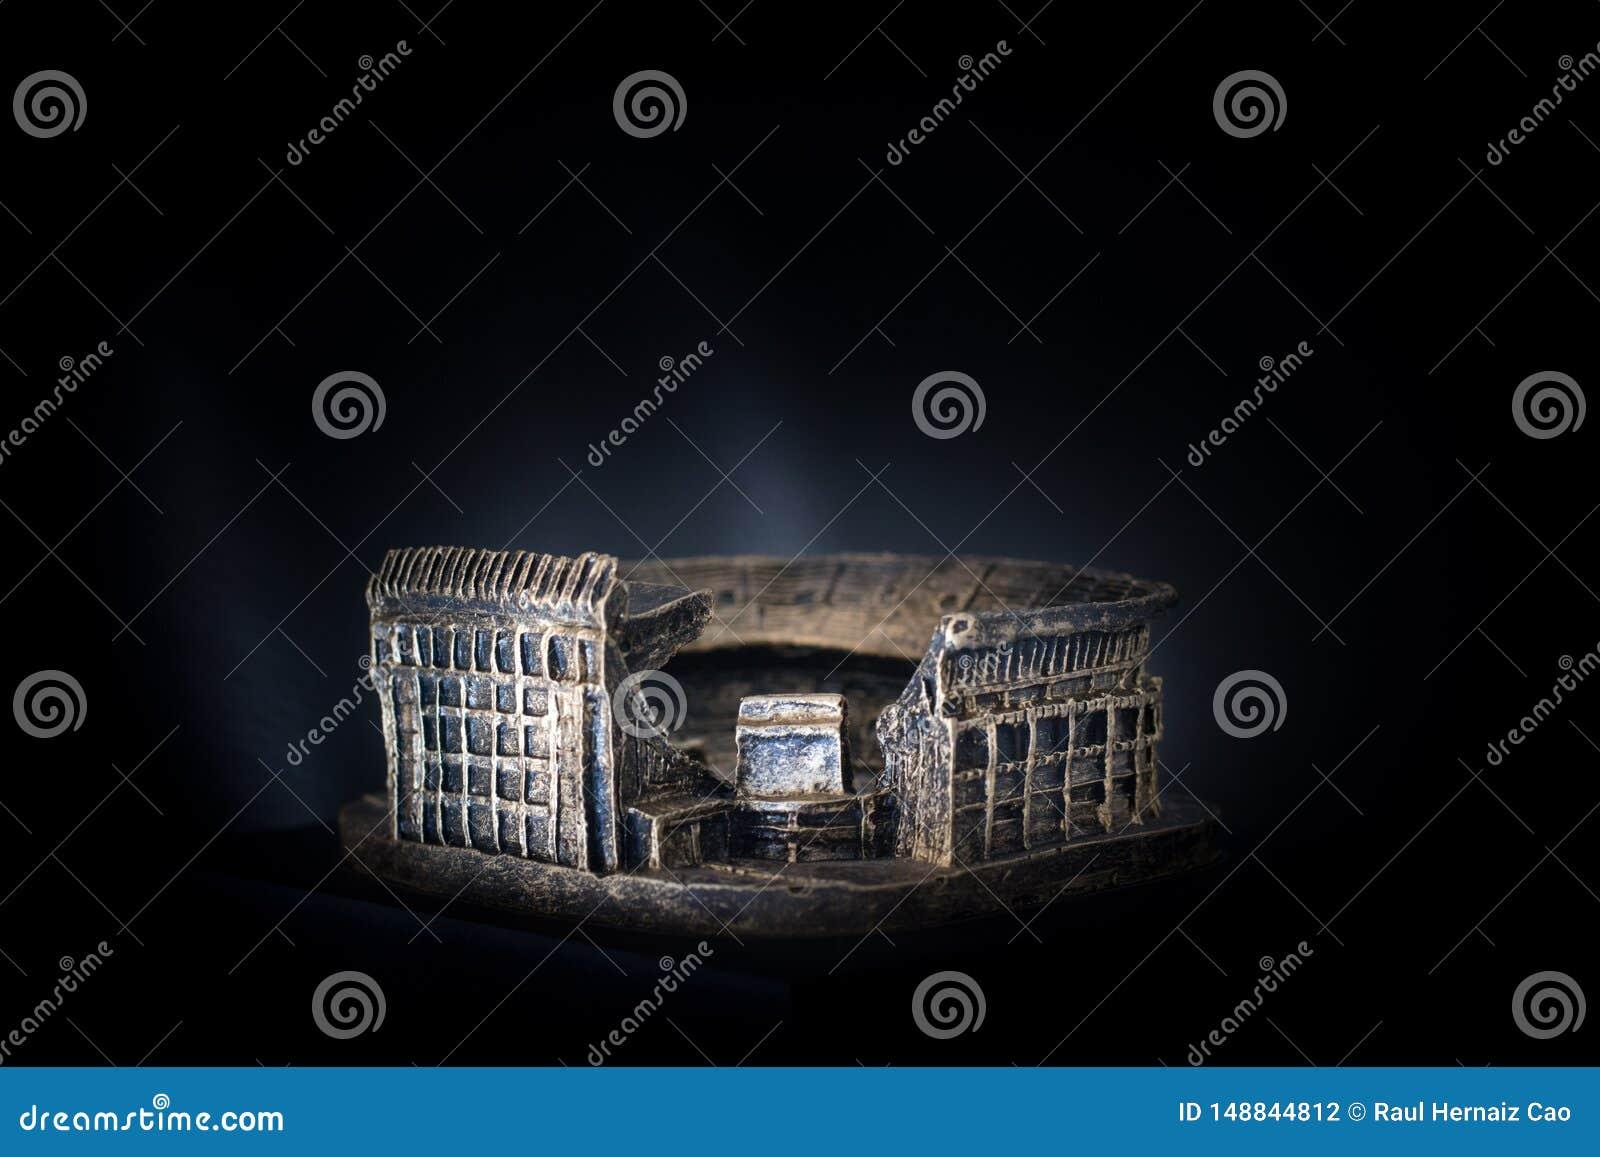 Vicente Calderon football stadium. Golden copy of the famous soccer team Atletico de Madrid stadium over a dark background